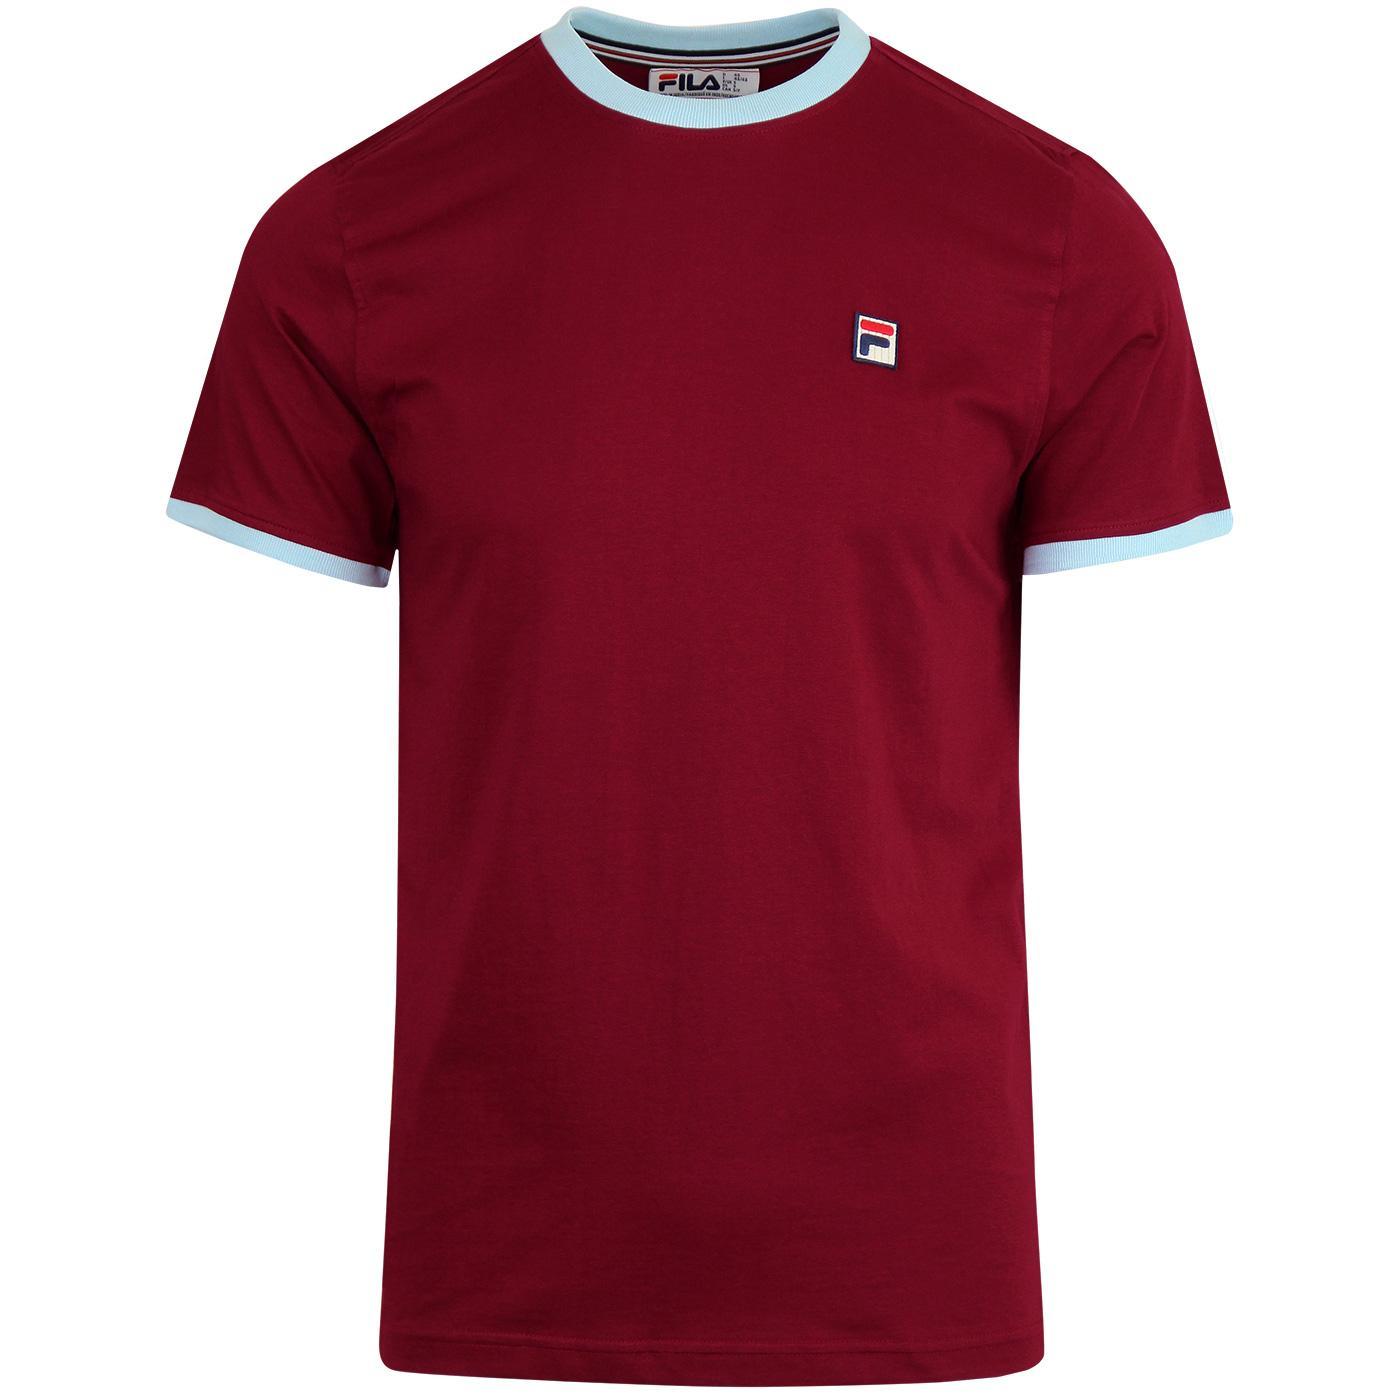 Marconi FILA VINTAGE Retro 70s Ringer T-Shirt (TR)